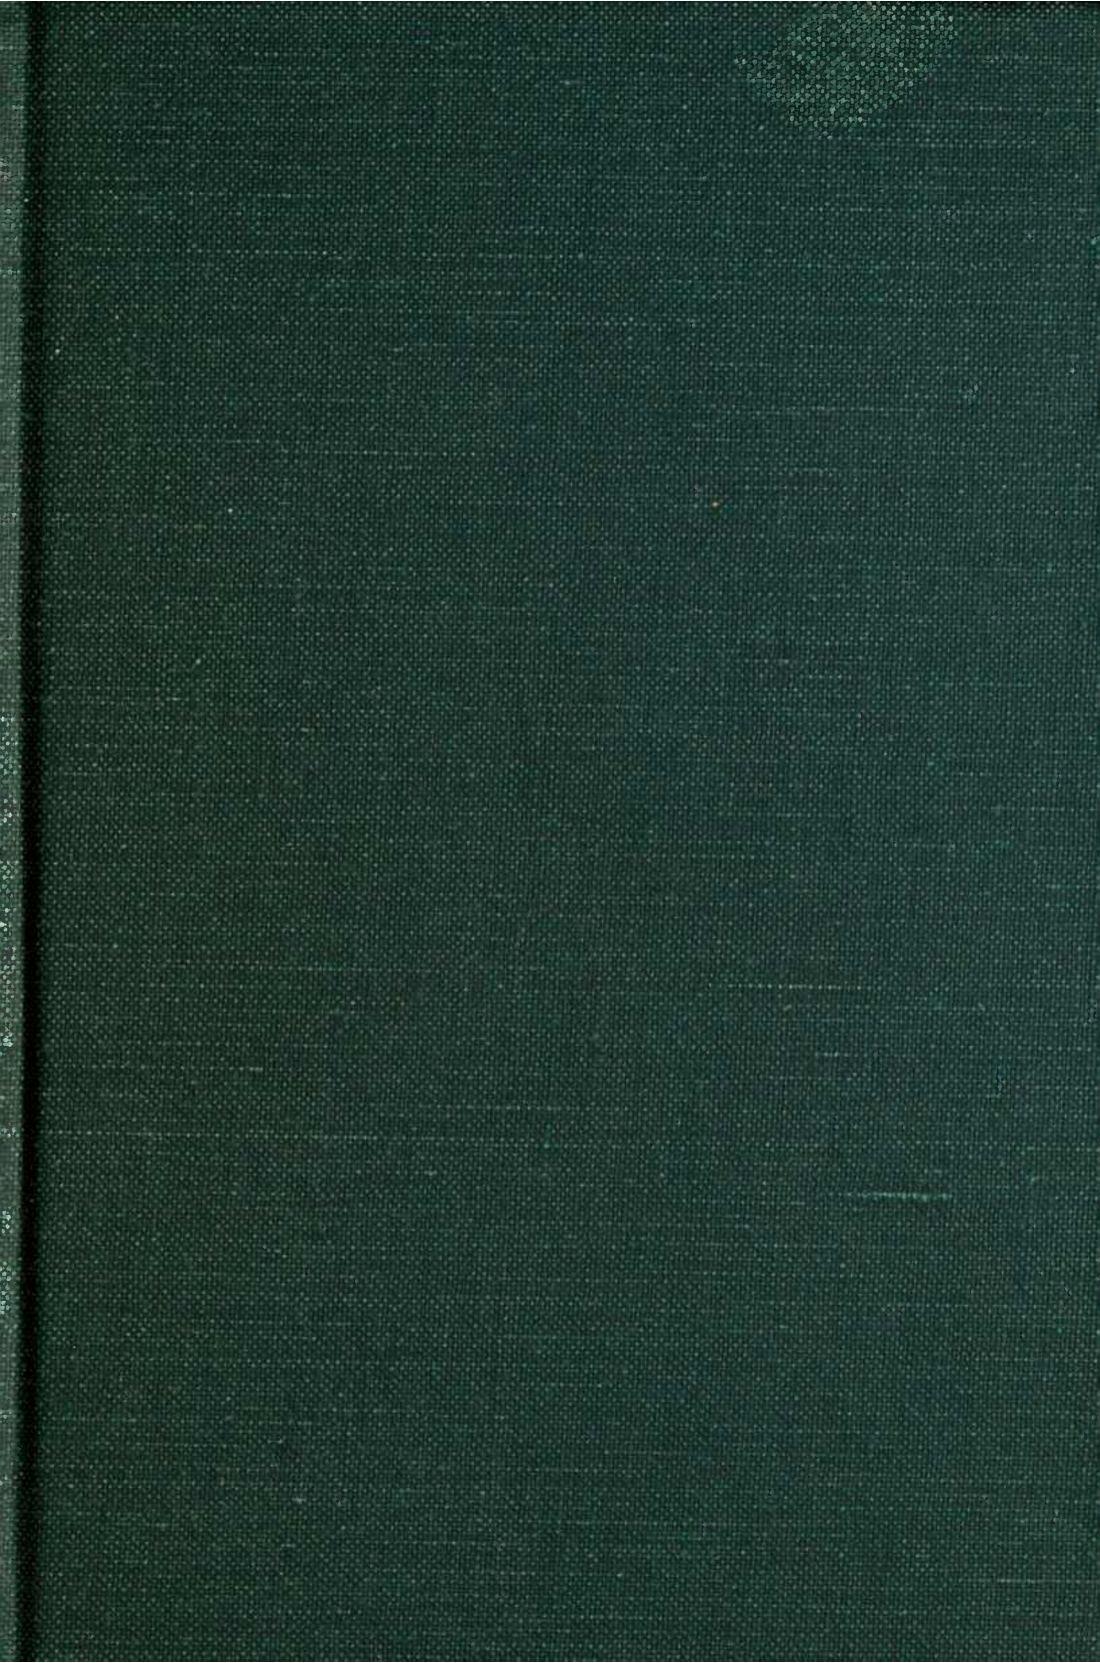 dcff1979c02f Calaméo - The Humbugs of the World